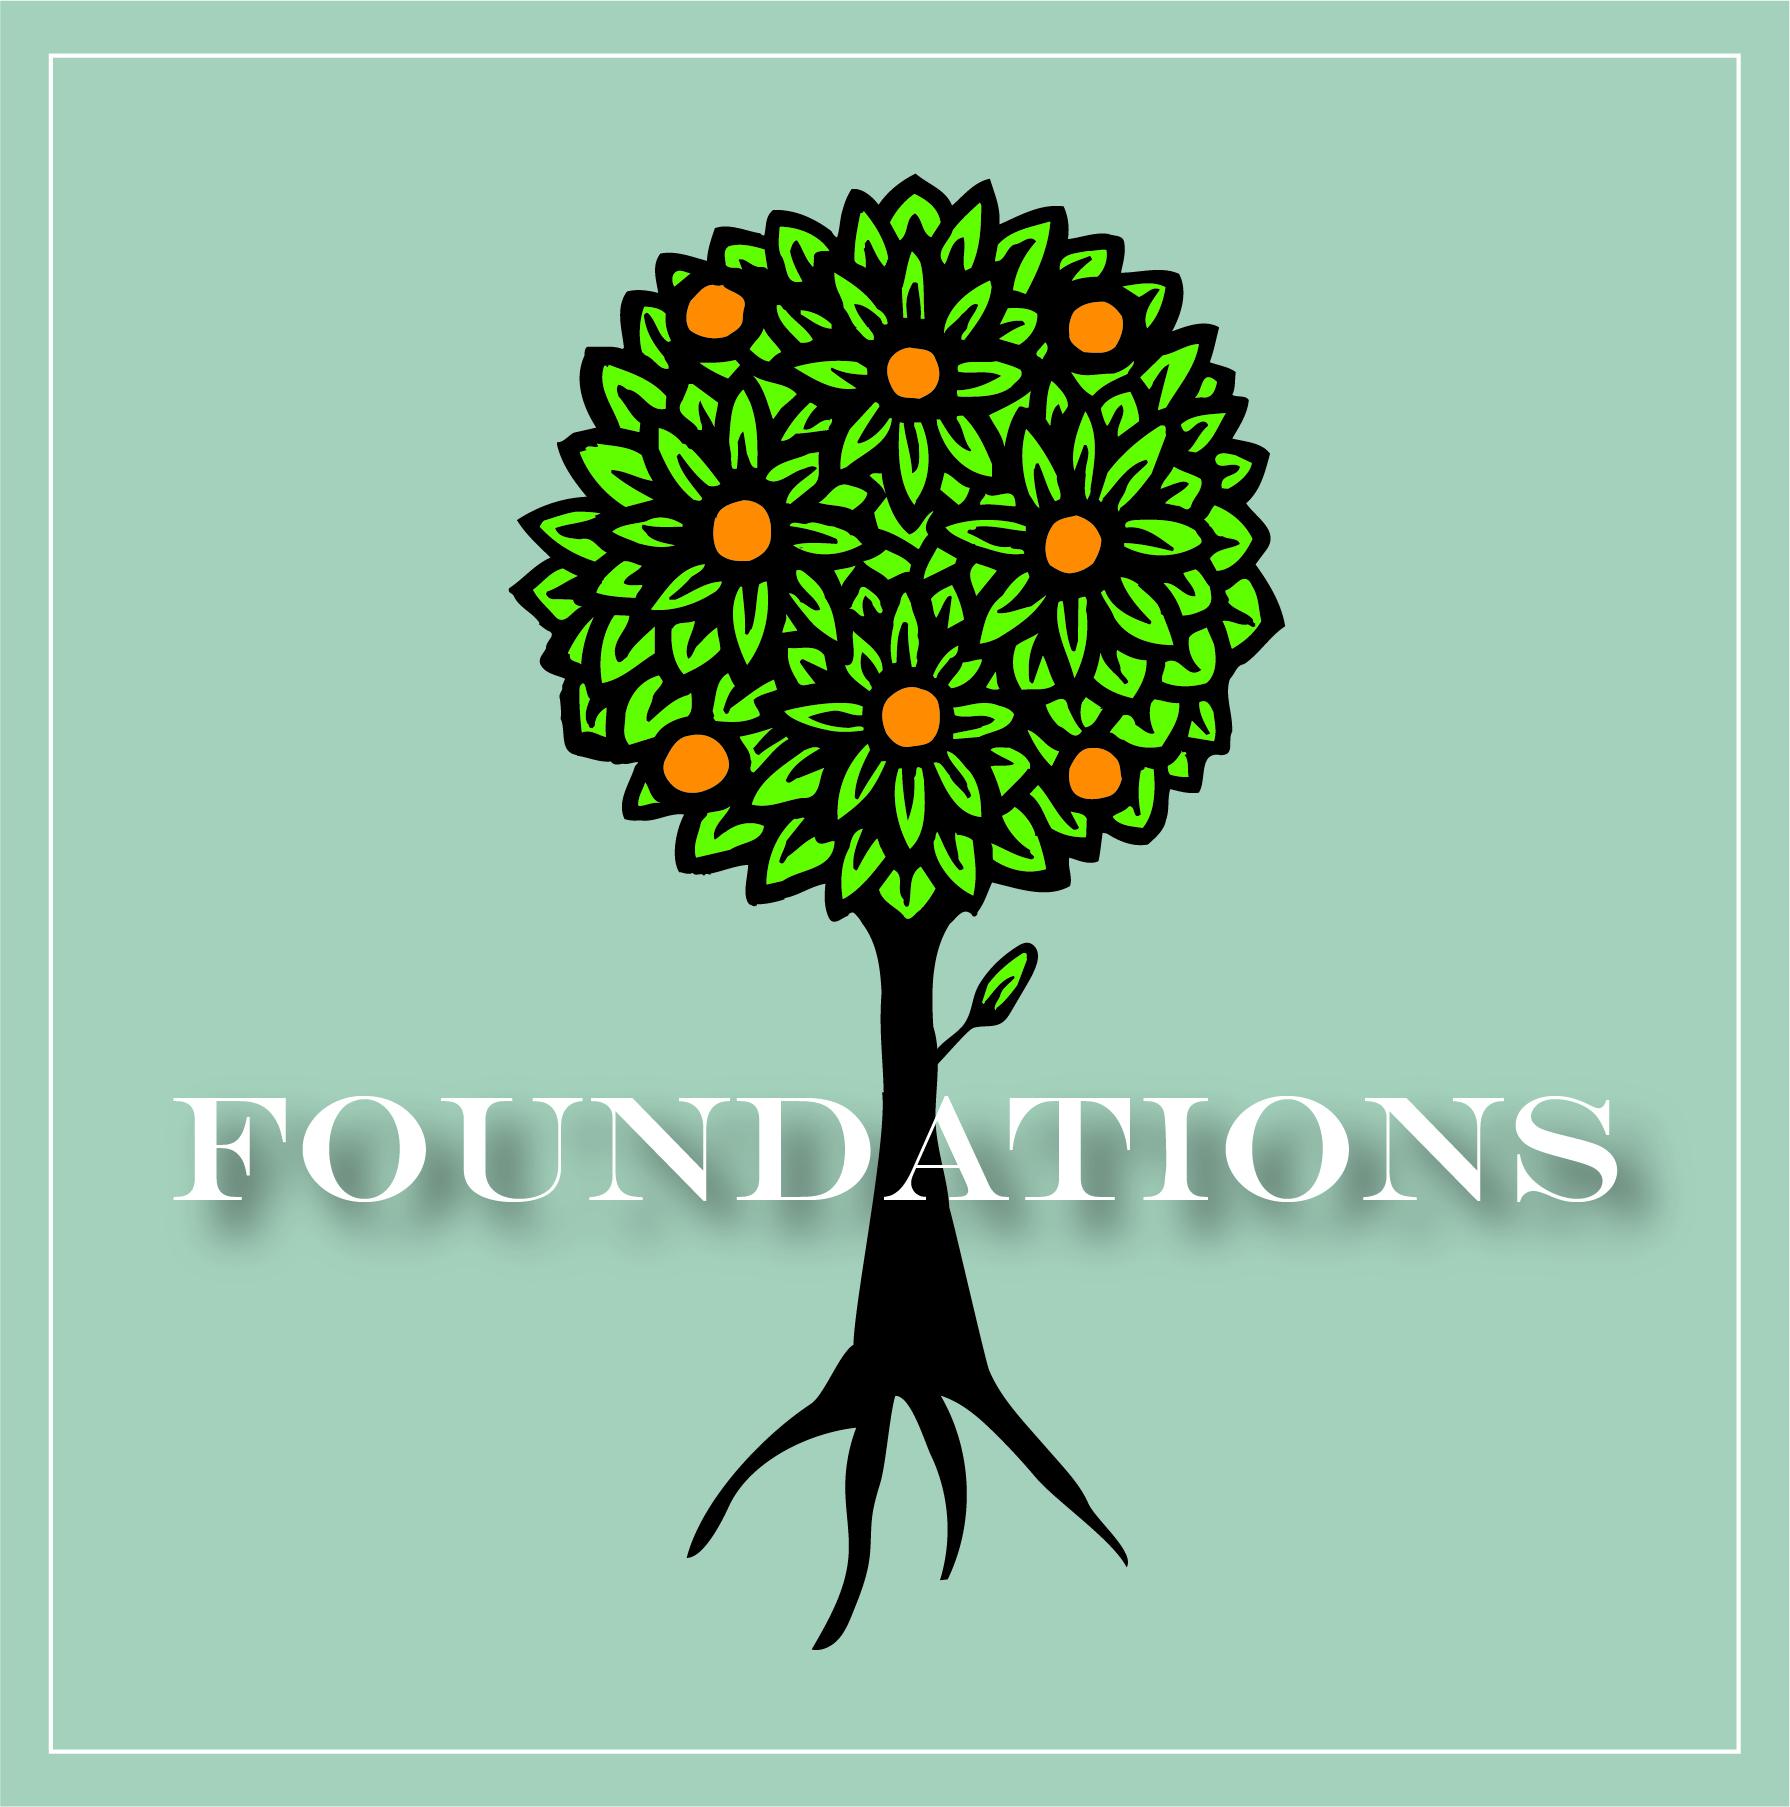 foundations sermon series graphic B.jpg